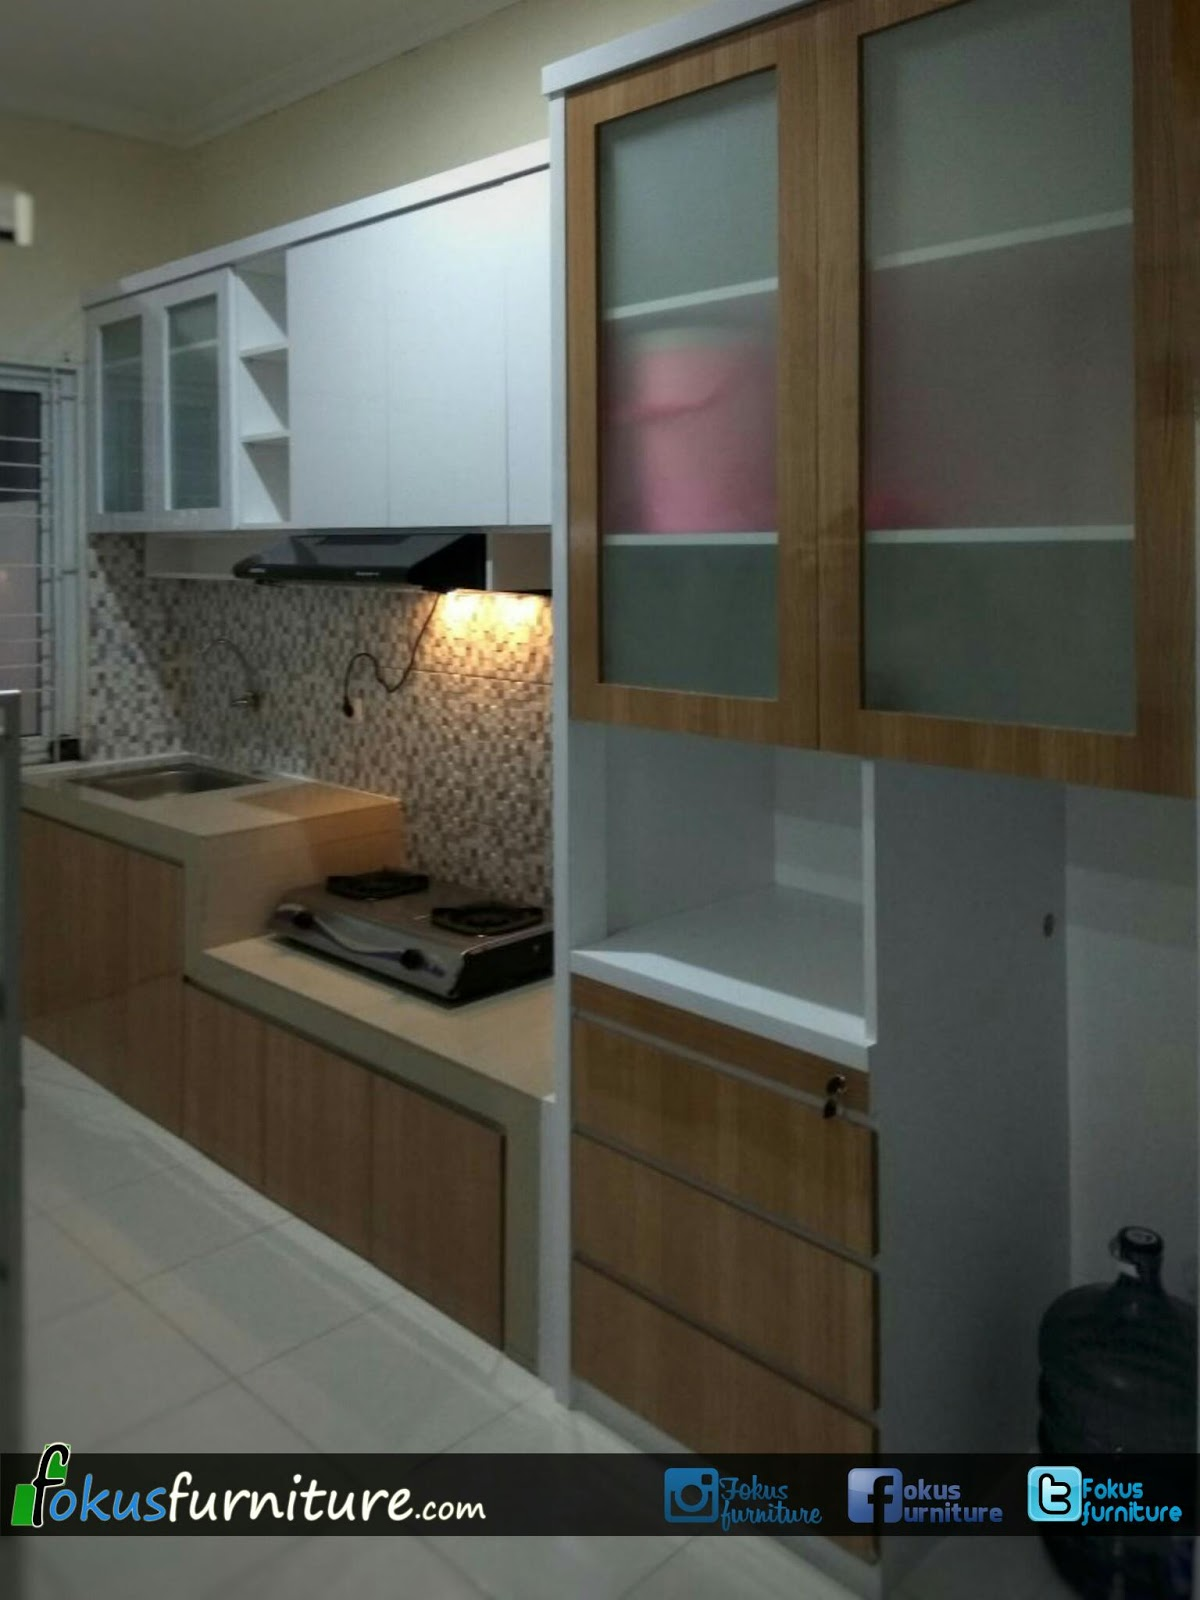 Kitchen set 2 pintu atas minimalis mutiara olympiccikiwulcluster alicanteperumahan metland